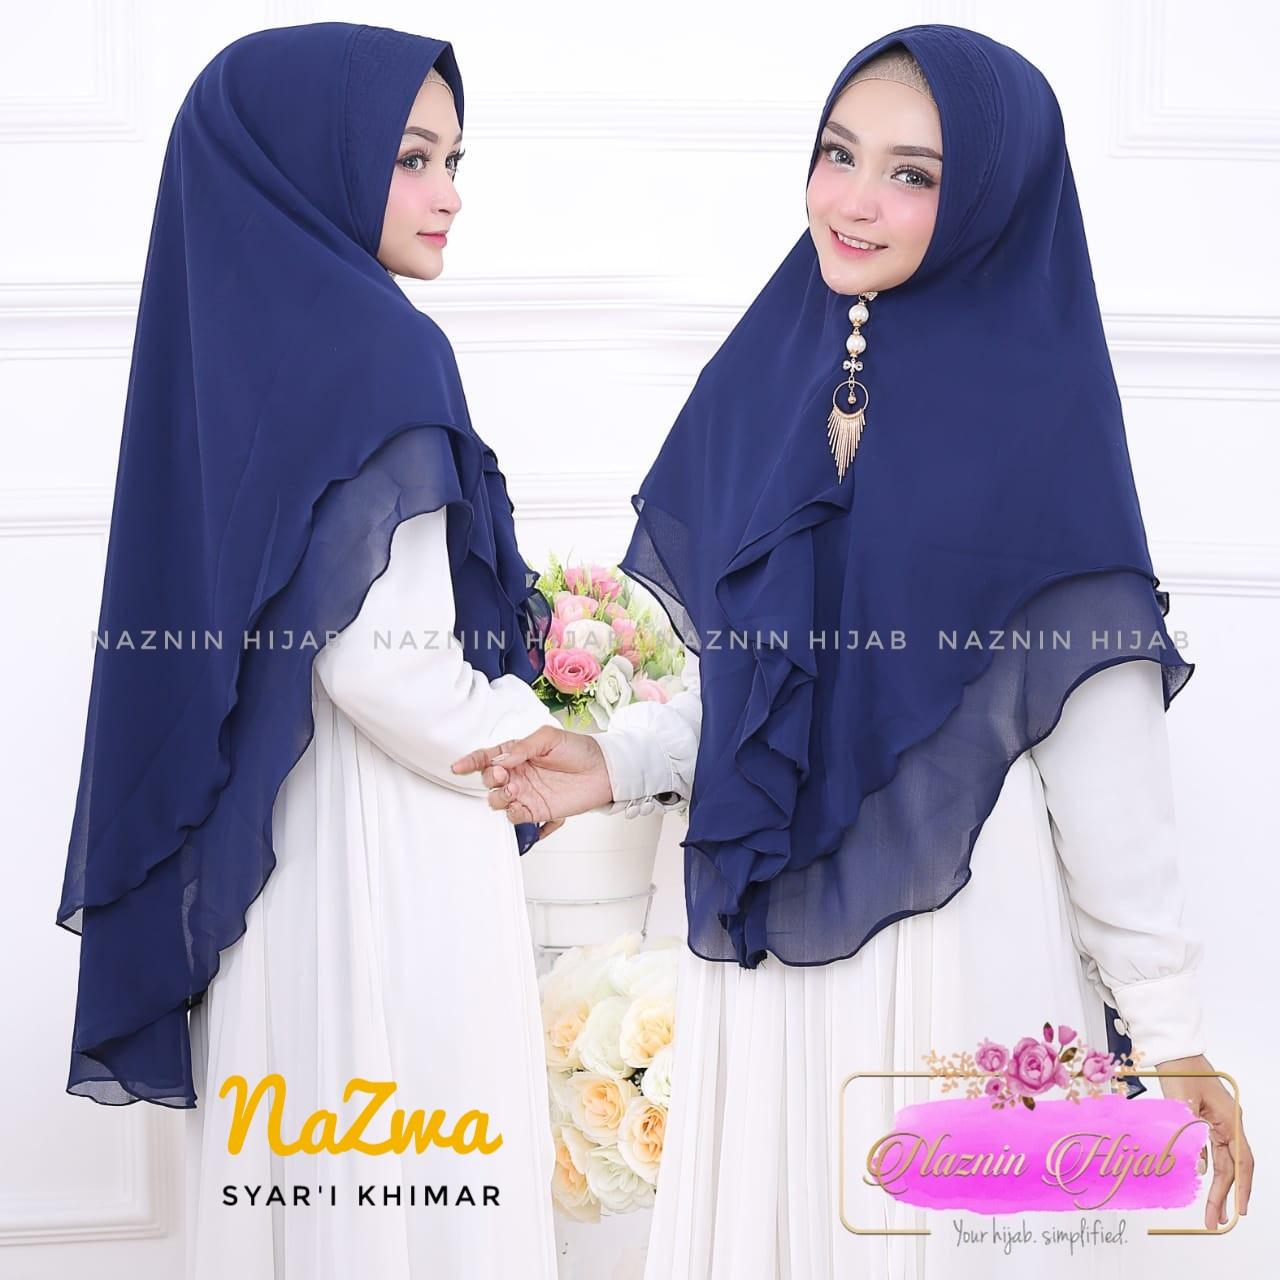 Baju Fashion Wanita Baju Muslim Hijab Jilbab Khimar Syari Nazma Rempel Terbaru